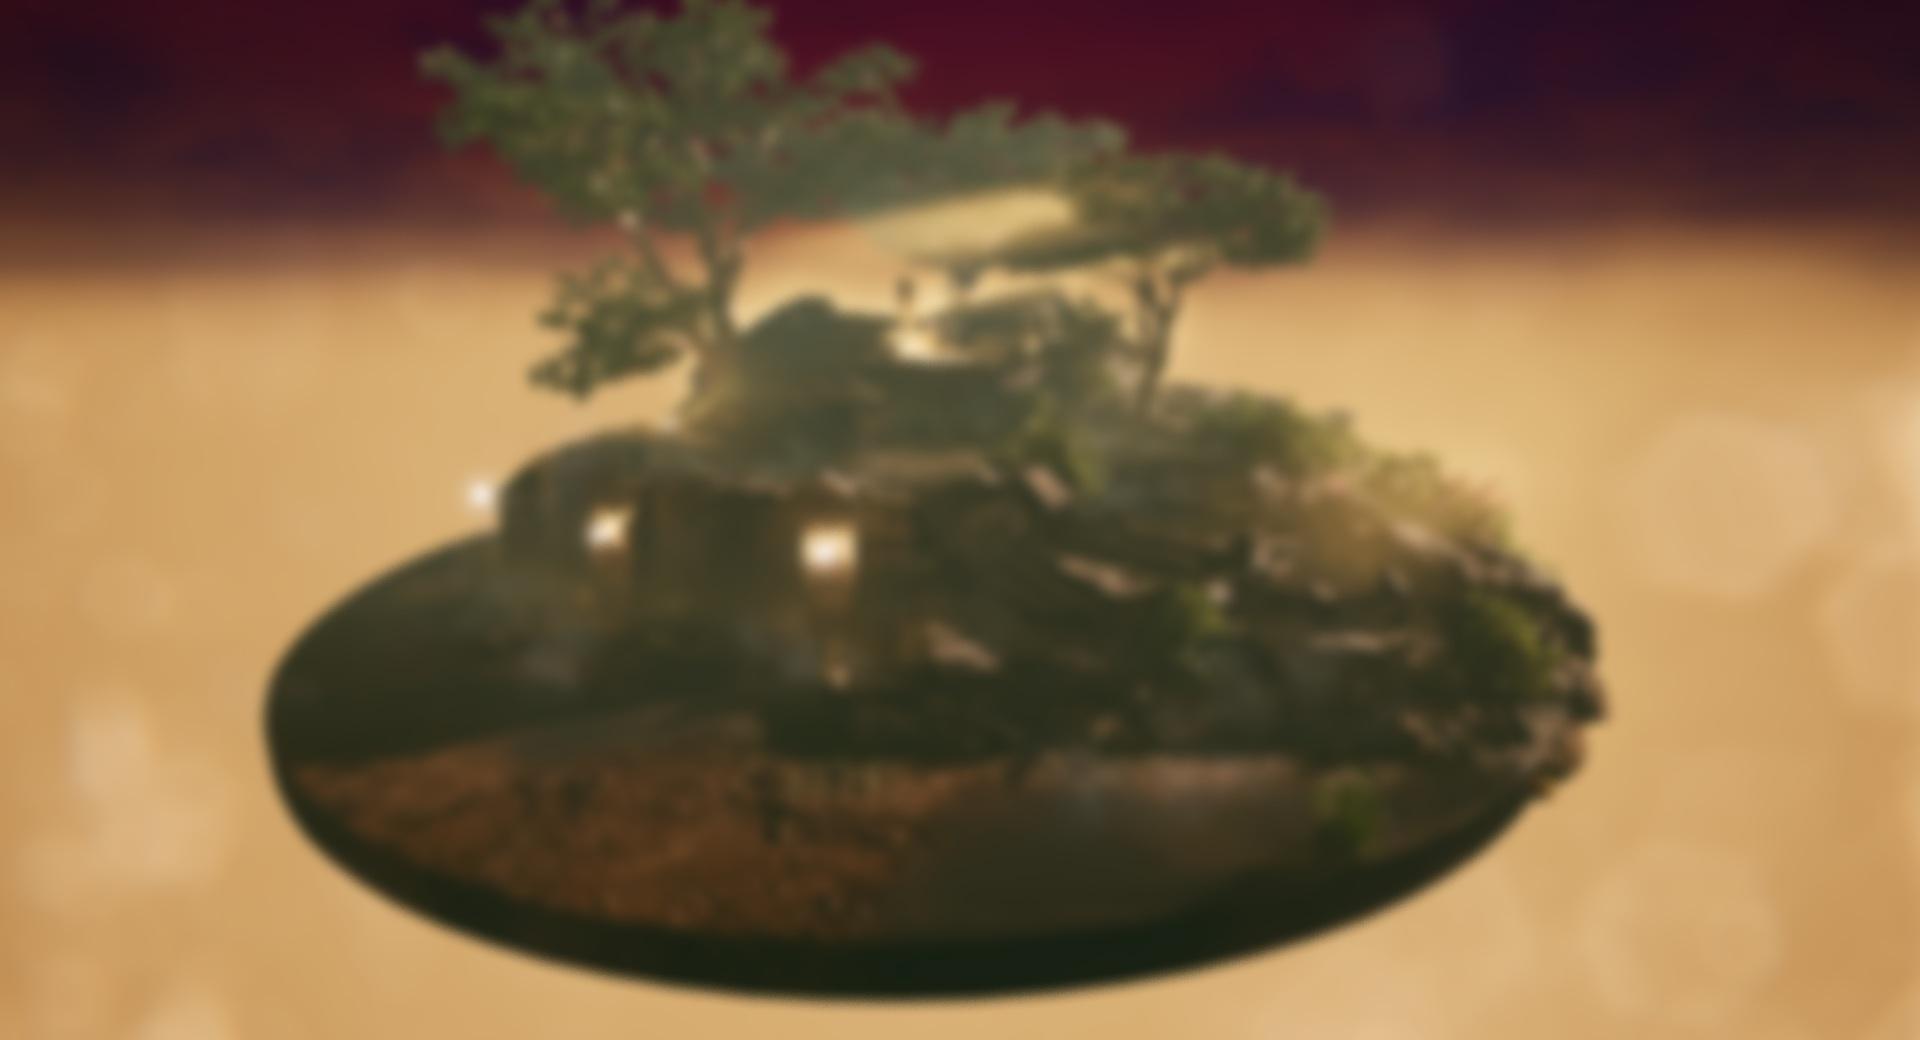 Diorama ruins dusk